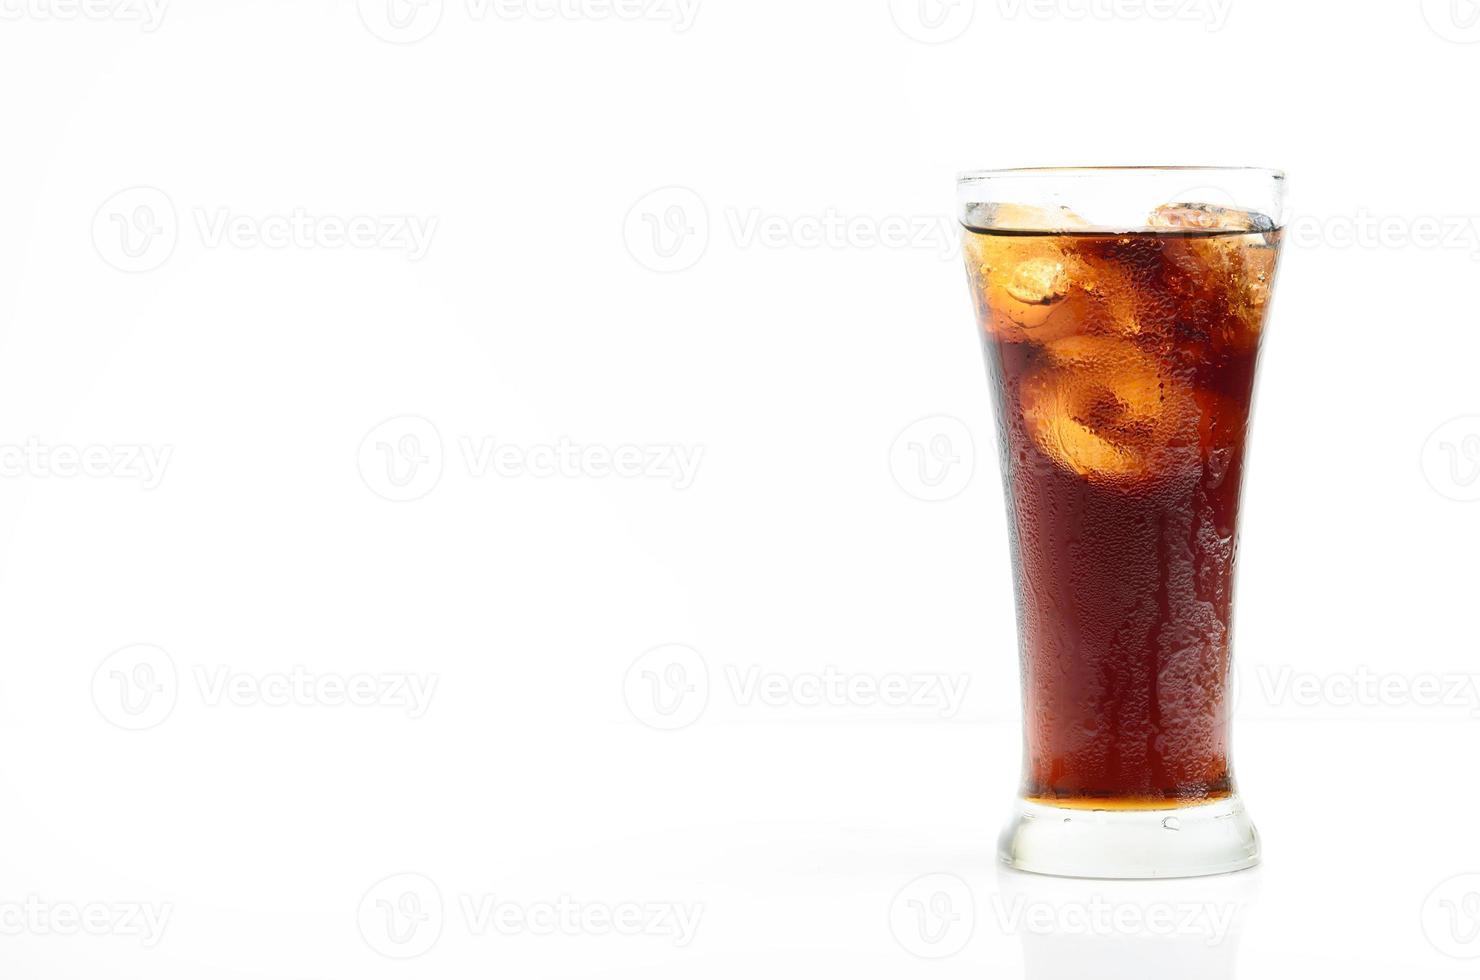 refrigerante foto